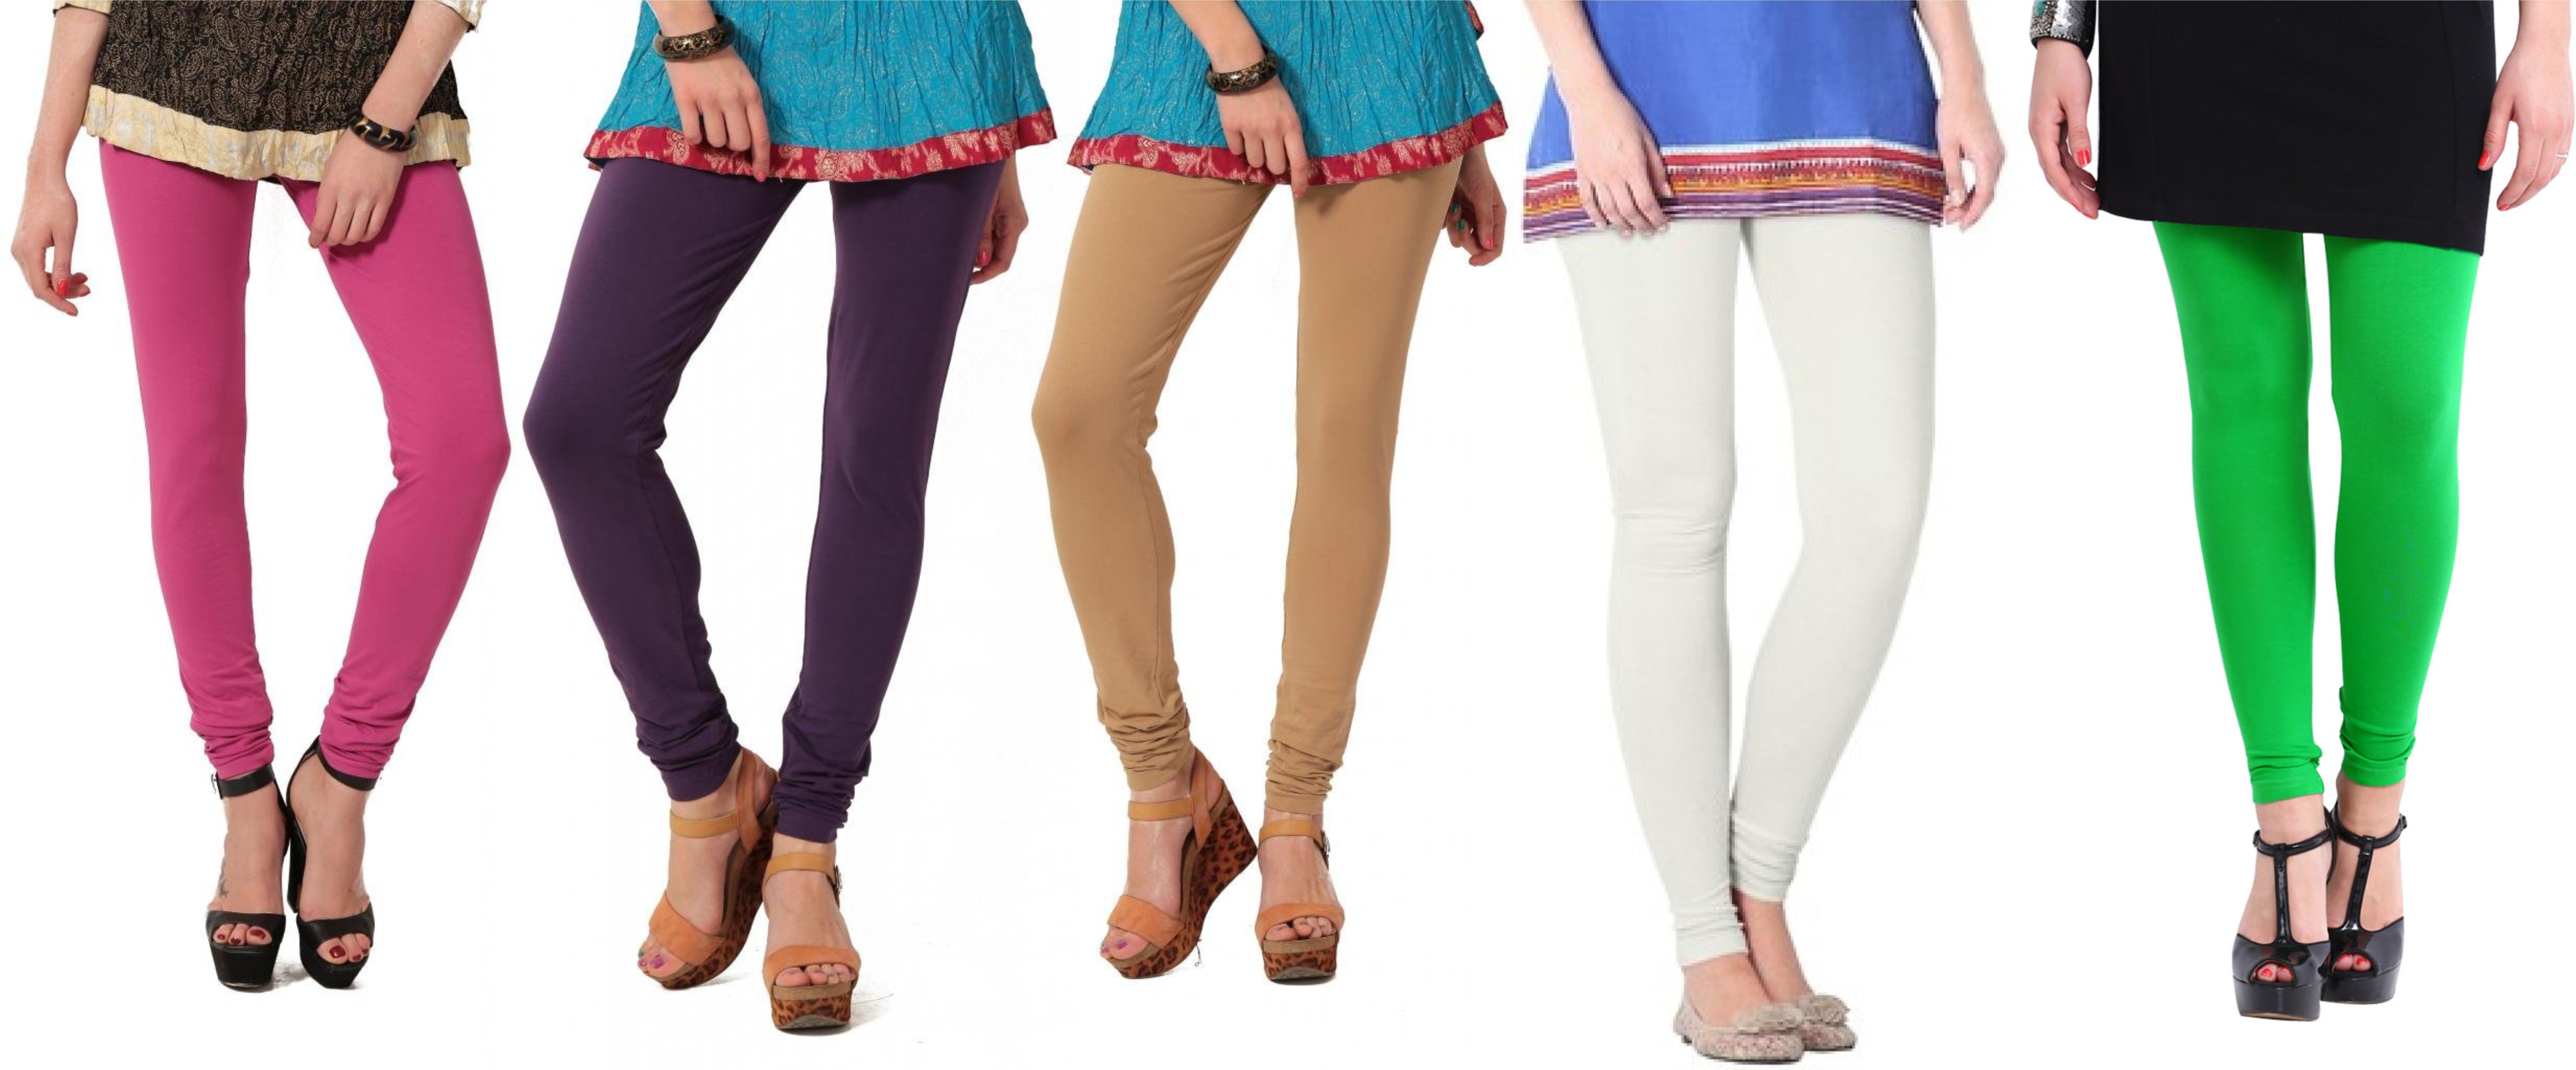 Angel Soft Womens Pink, Purple, Beige, White, Green Leggings(Pack of 5)